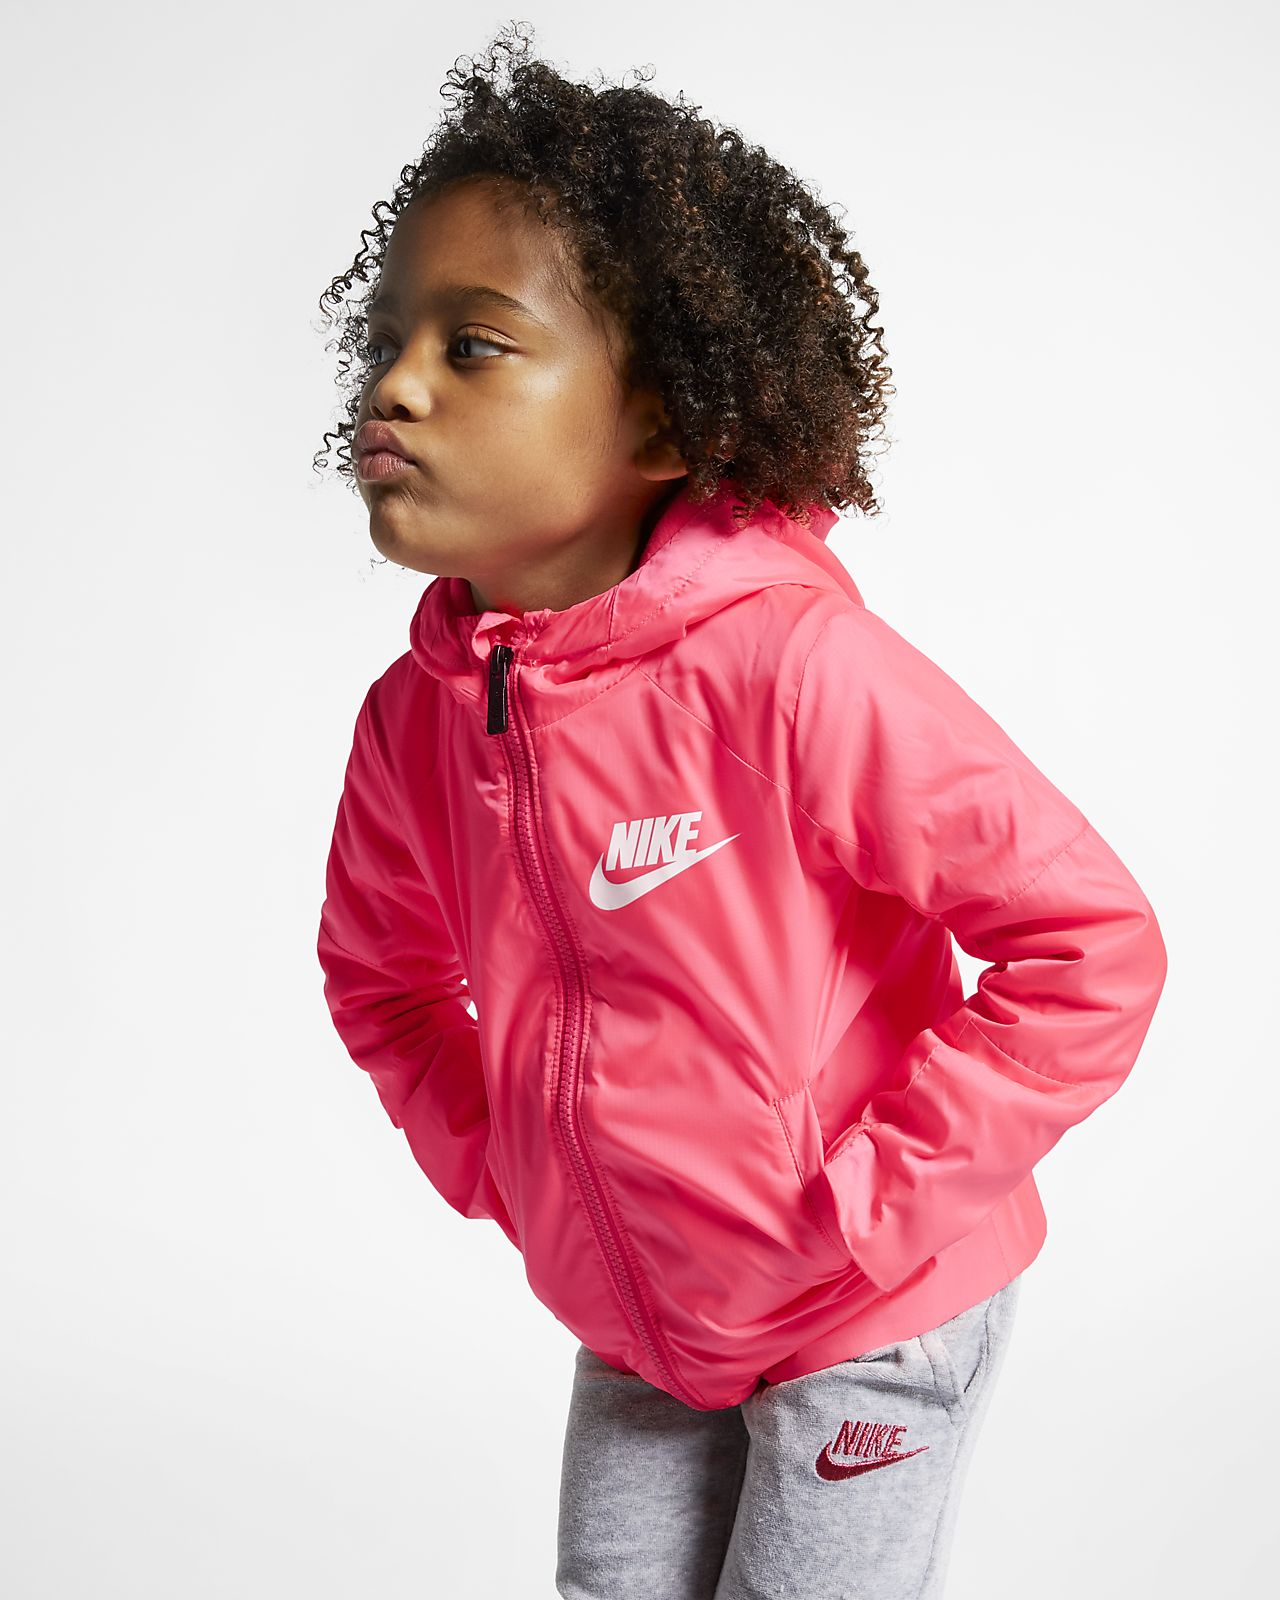 Nike Sportswear Jaqueta - Nen/a petit/a